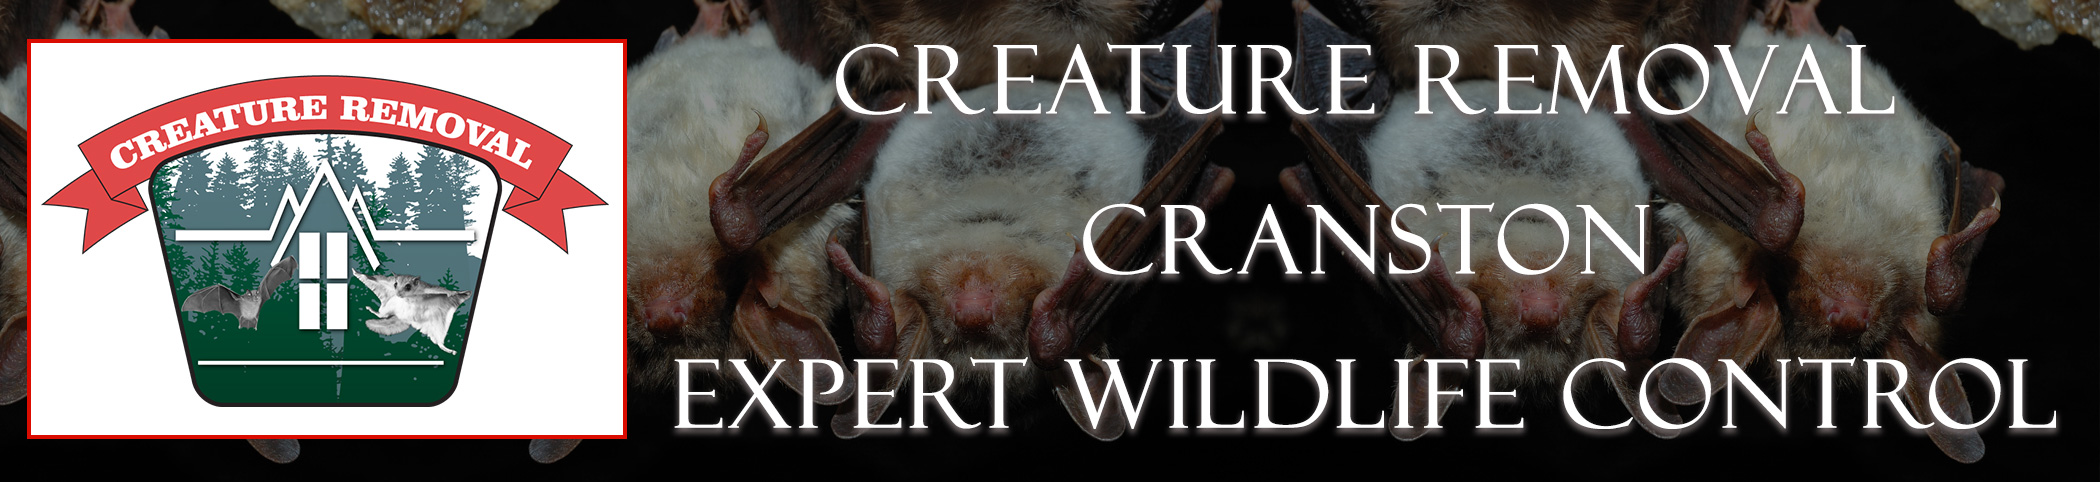 cranston-rhode-island-creature-removal-header